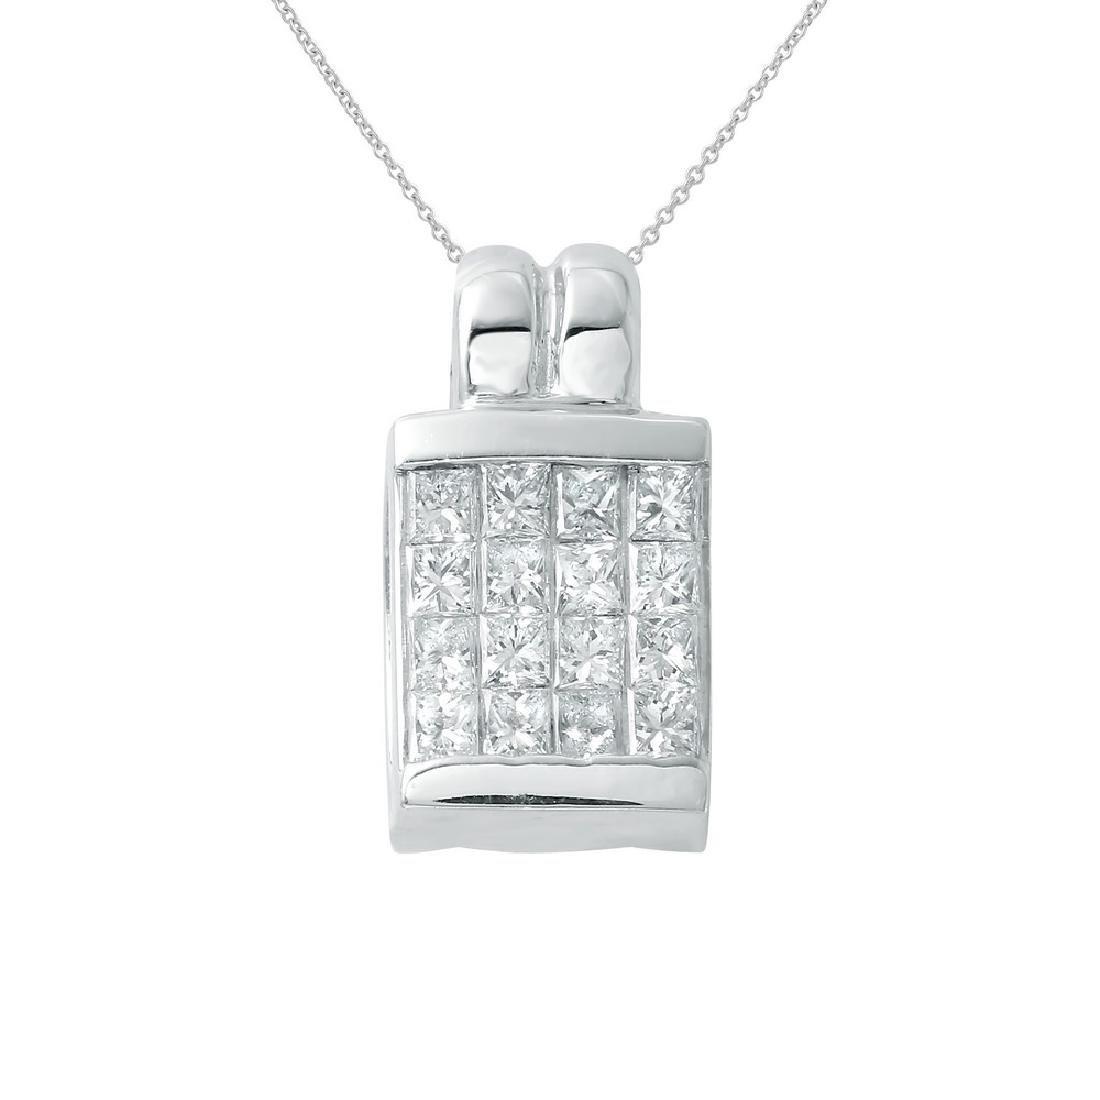 Genuine 0.66 TCW 18K White Gold Ladies Pendant